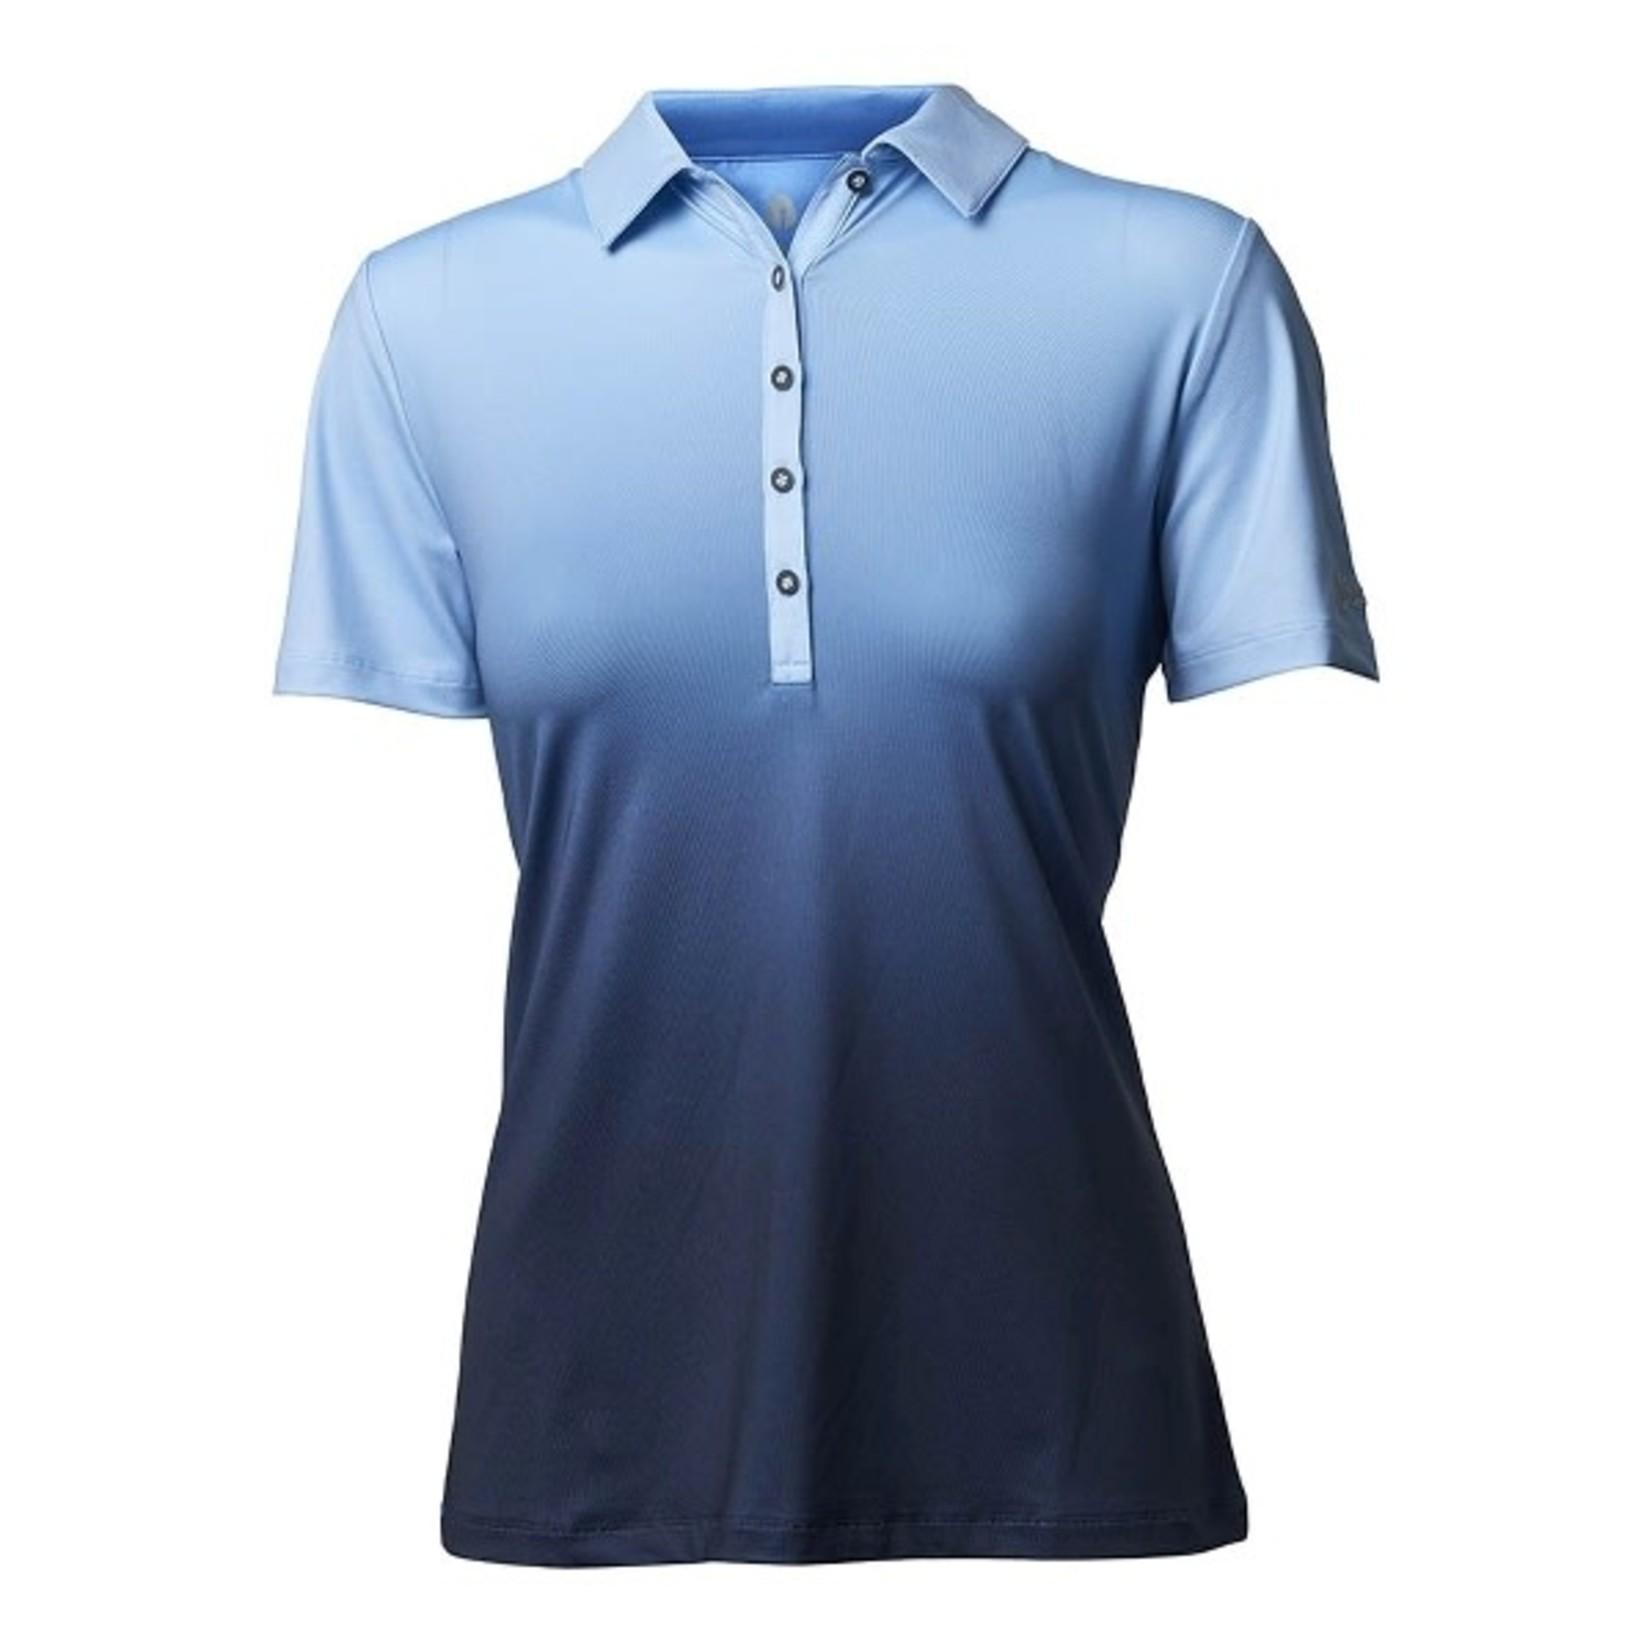 Backtee Backtee Ladies Dip Dye Polo blauw XL